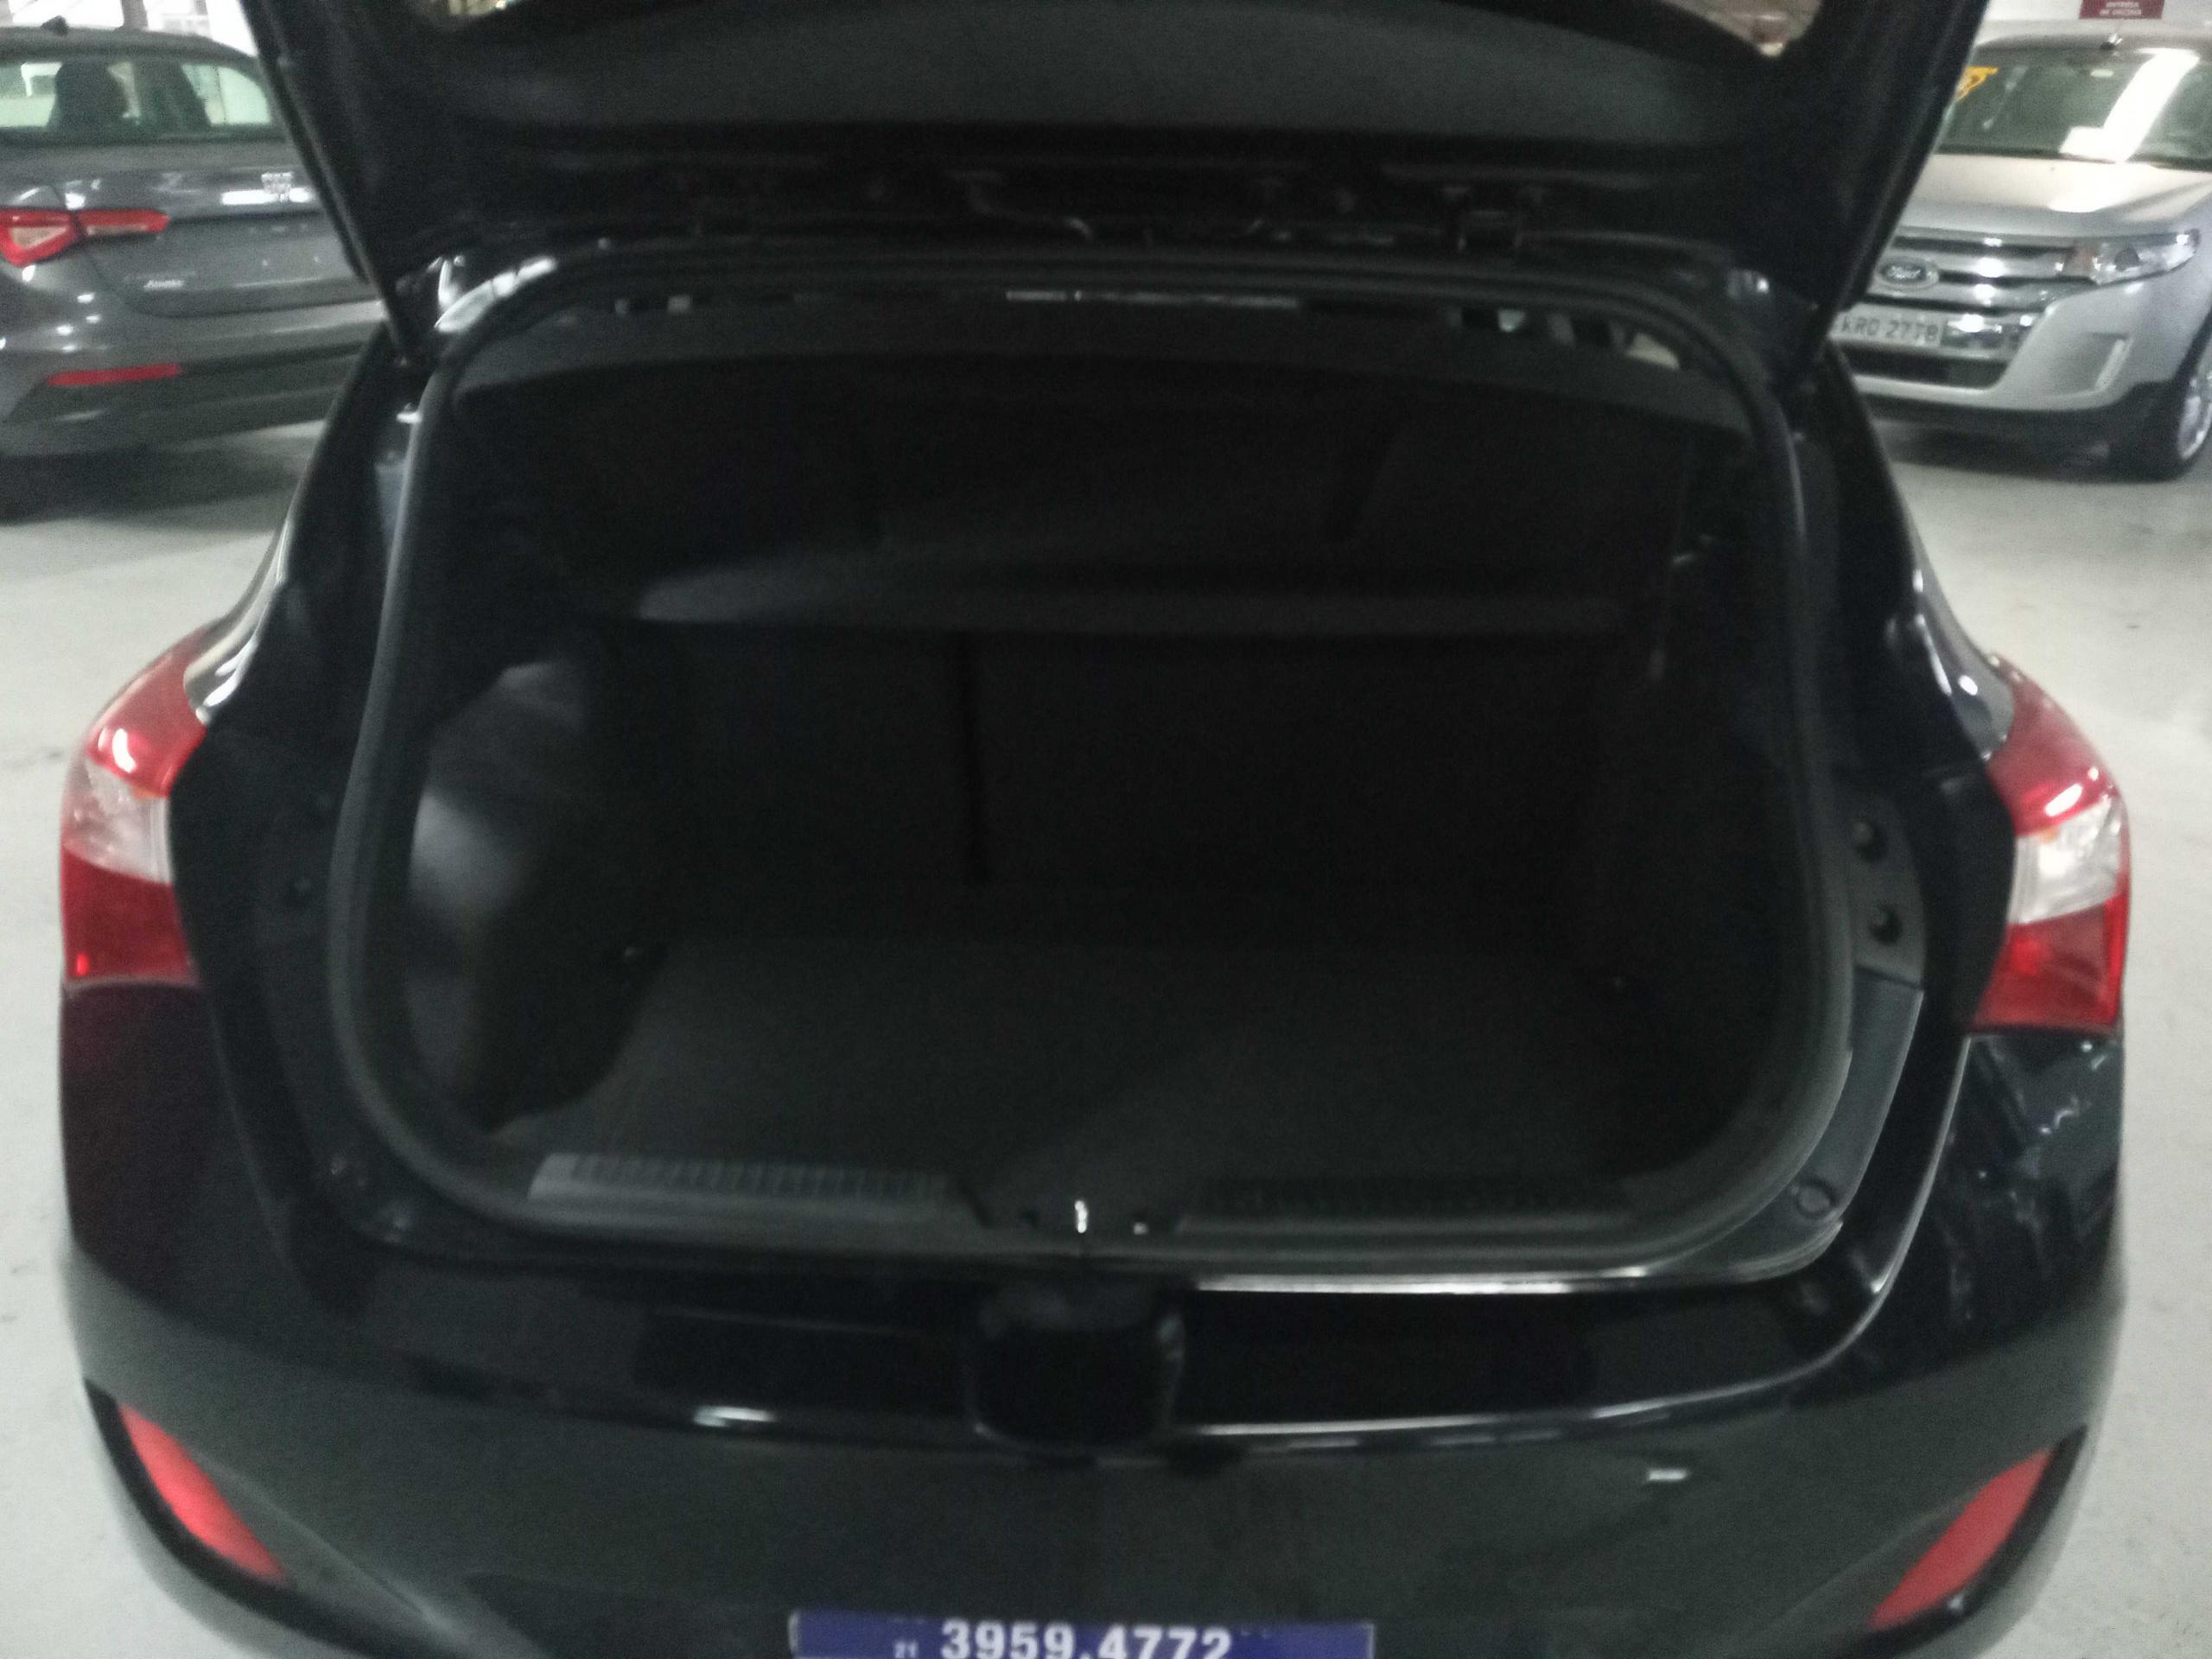 HYUNDAI I30 I30 GLS 1.8 16V MPI (AUT) C149